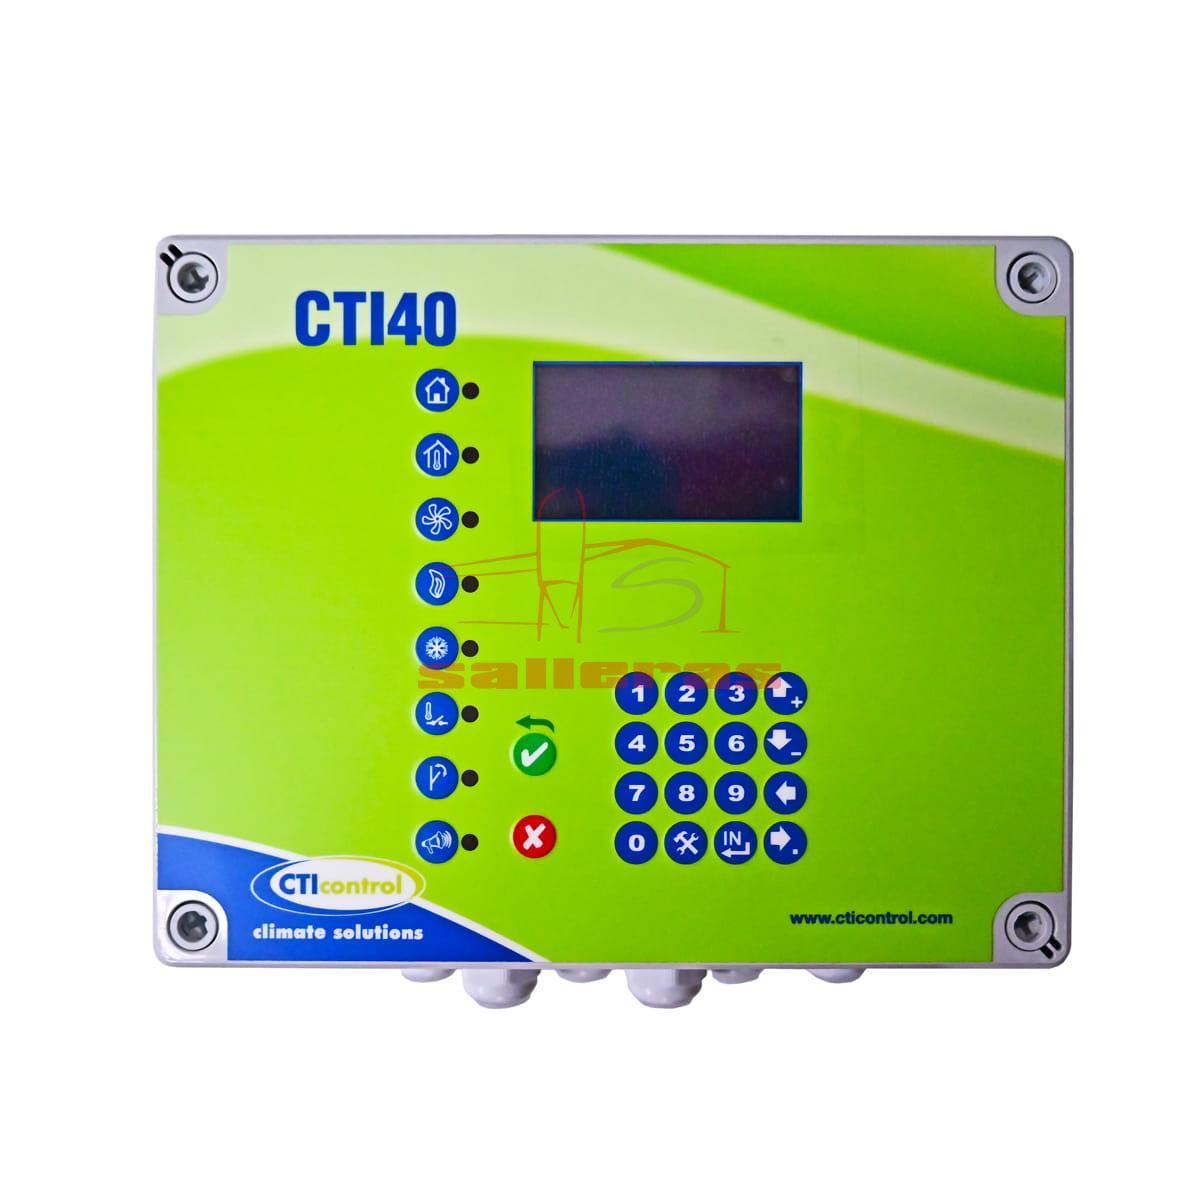 Regulador cti 40 de 6 amperios